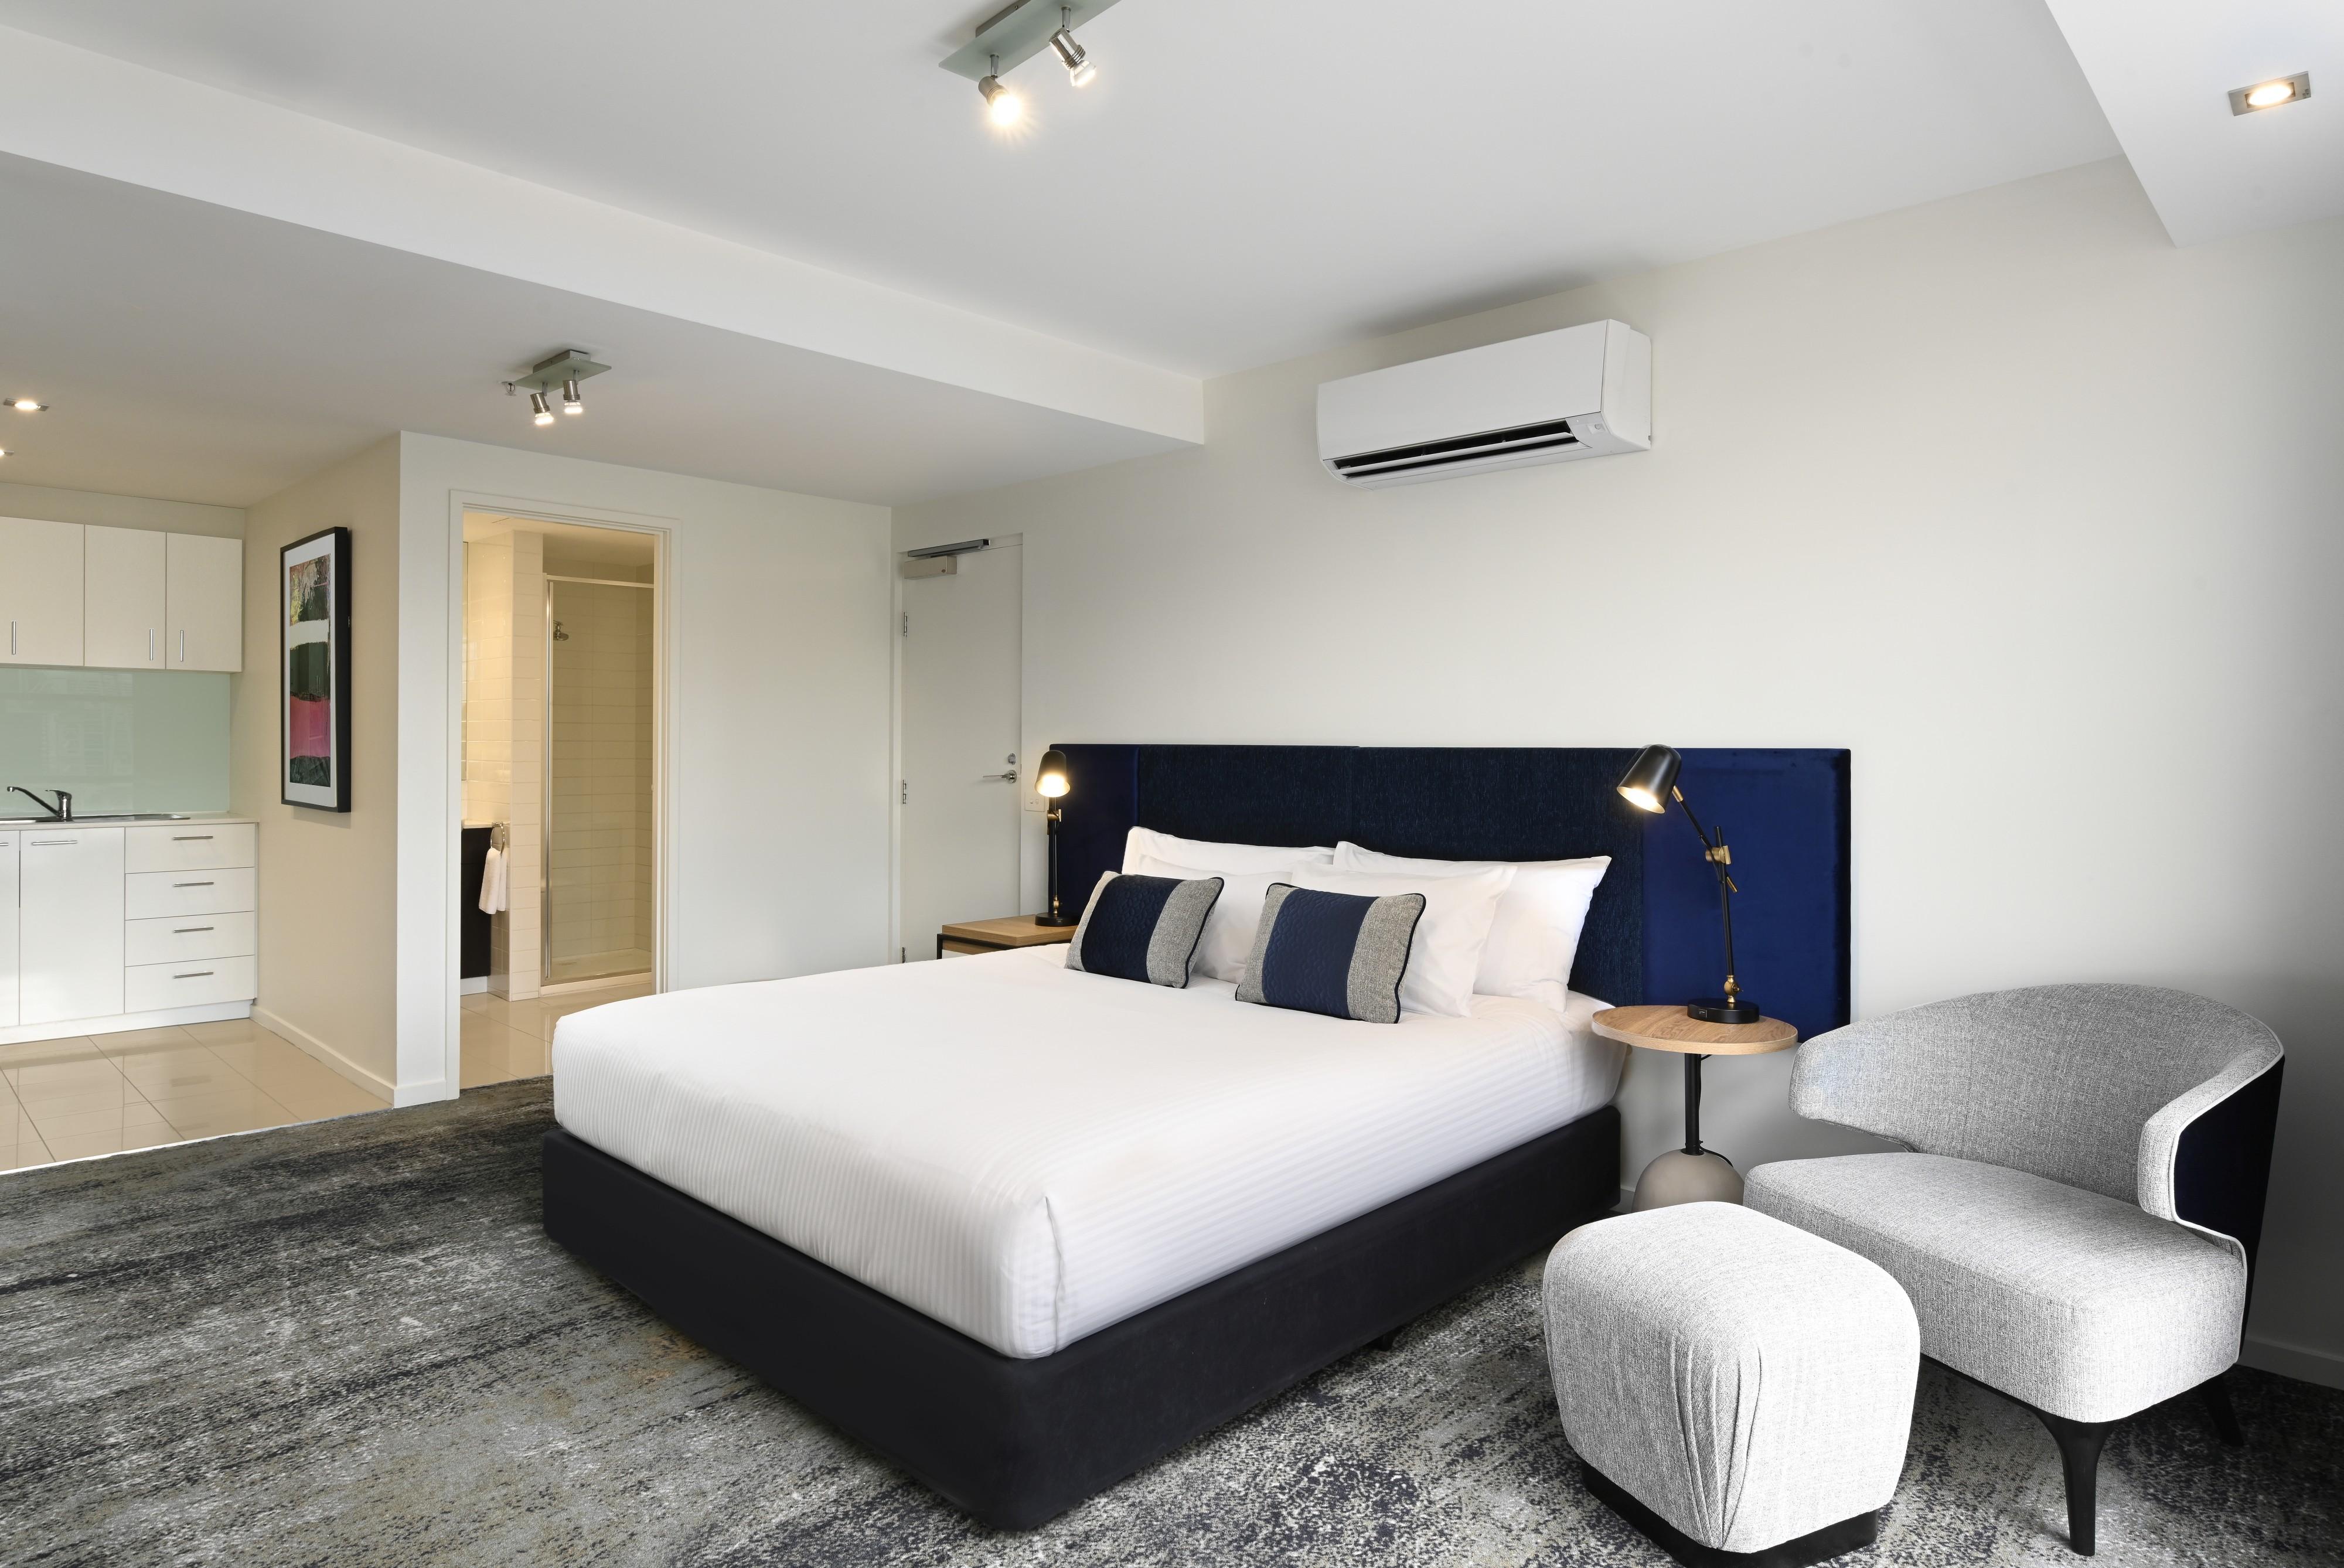 Adina Apartment Hotel Melbourne, Northbank | 550 Flinders Street, Melbourne, Victoria 3000 | +61 3 9246 0000